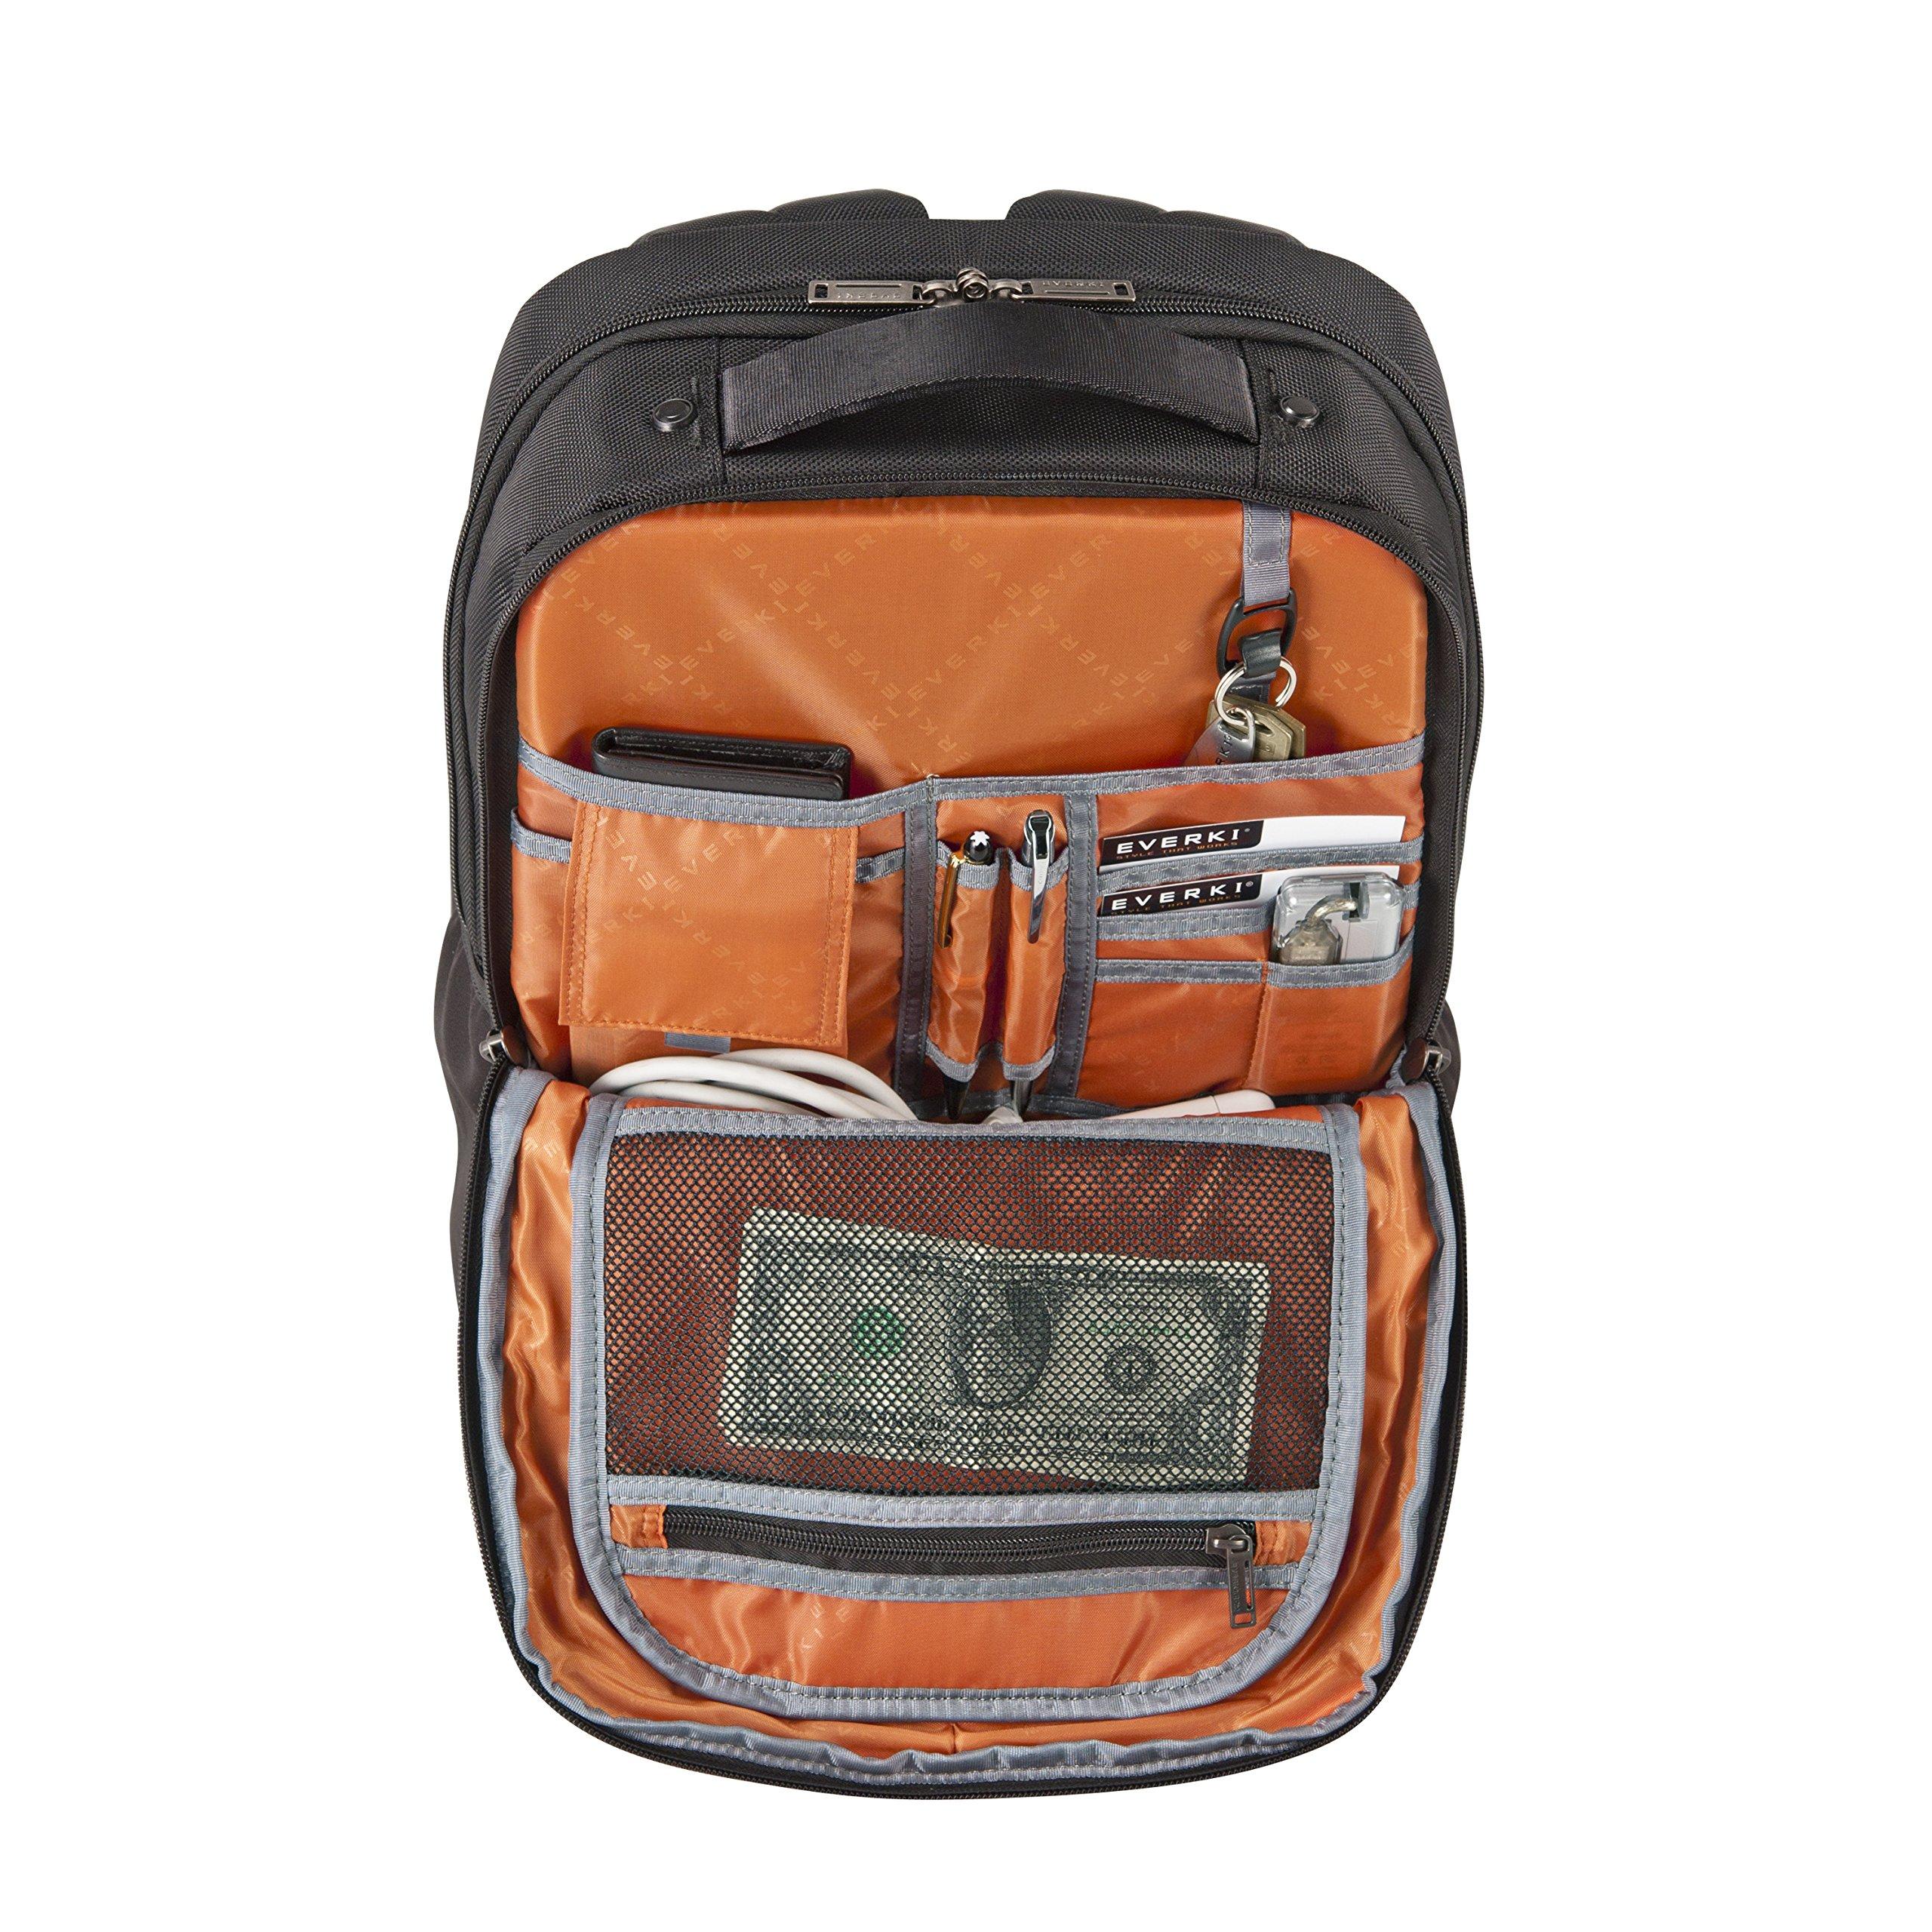 Everki Studio Slim Laptop Backpack for upto 14.1-Inch Laptops/15-Inch MacBook Pro (EKP118) by Everki (Image #5)